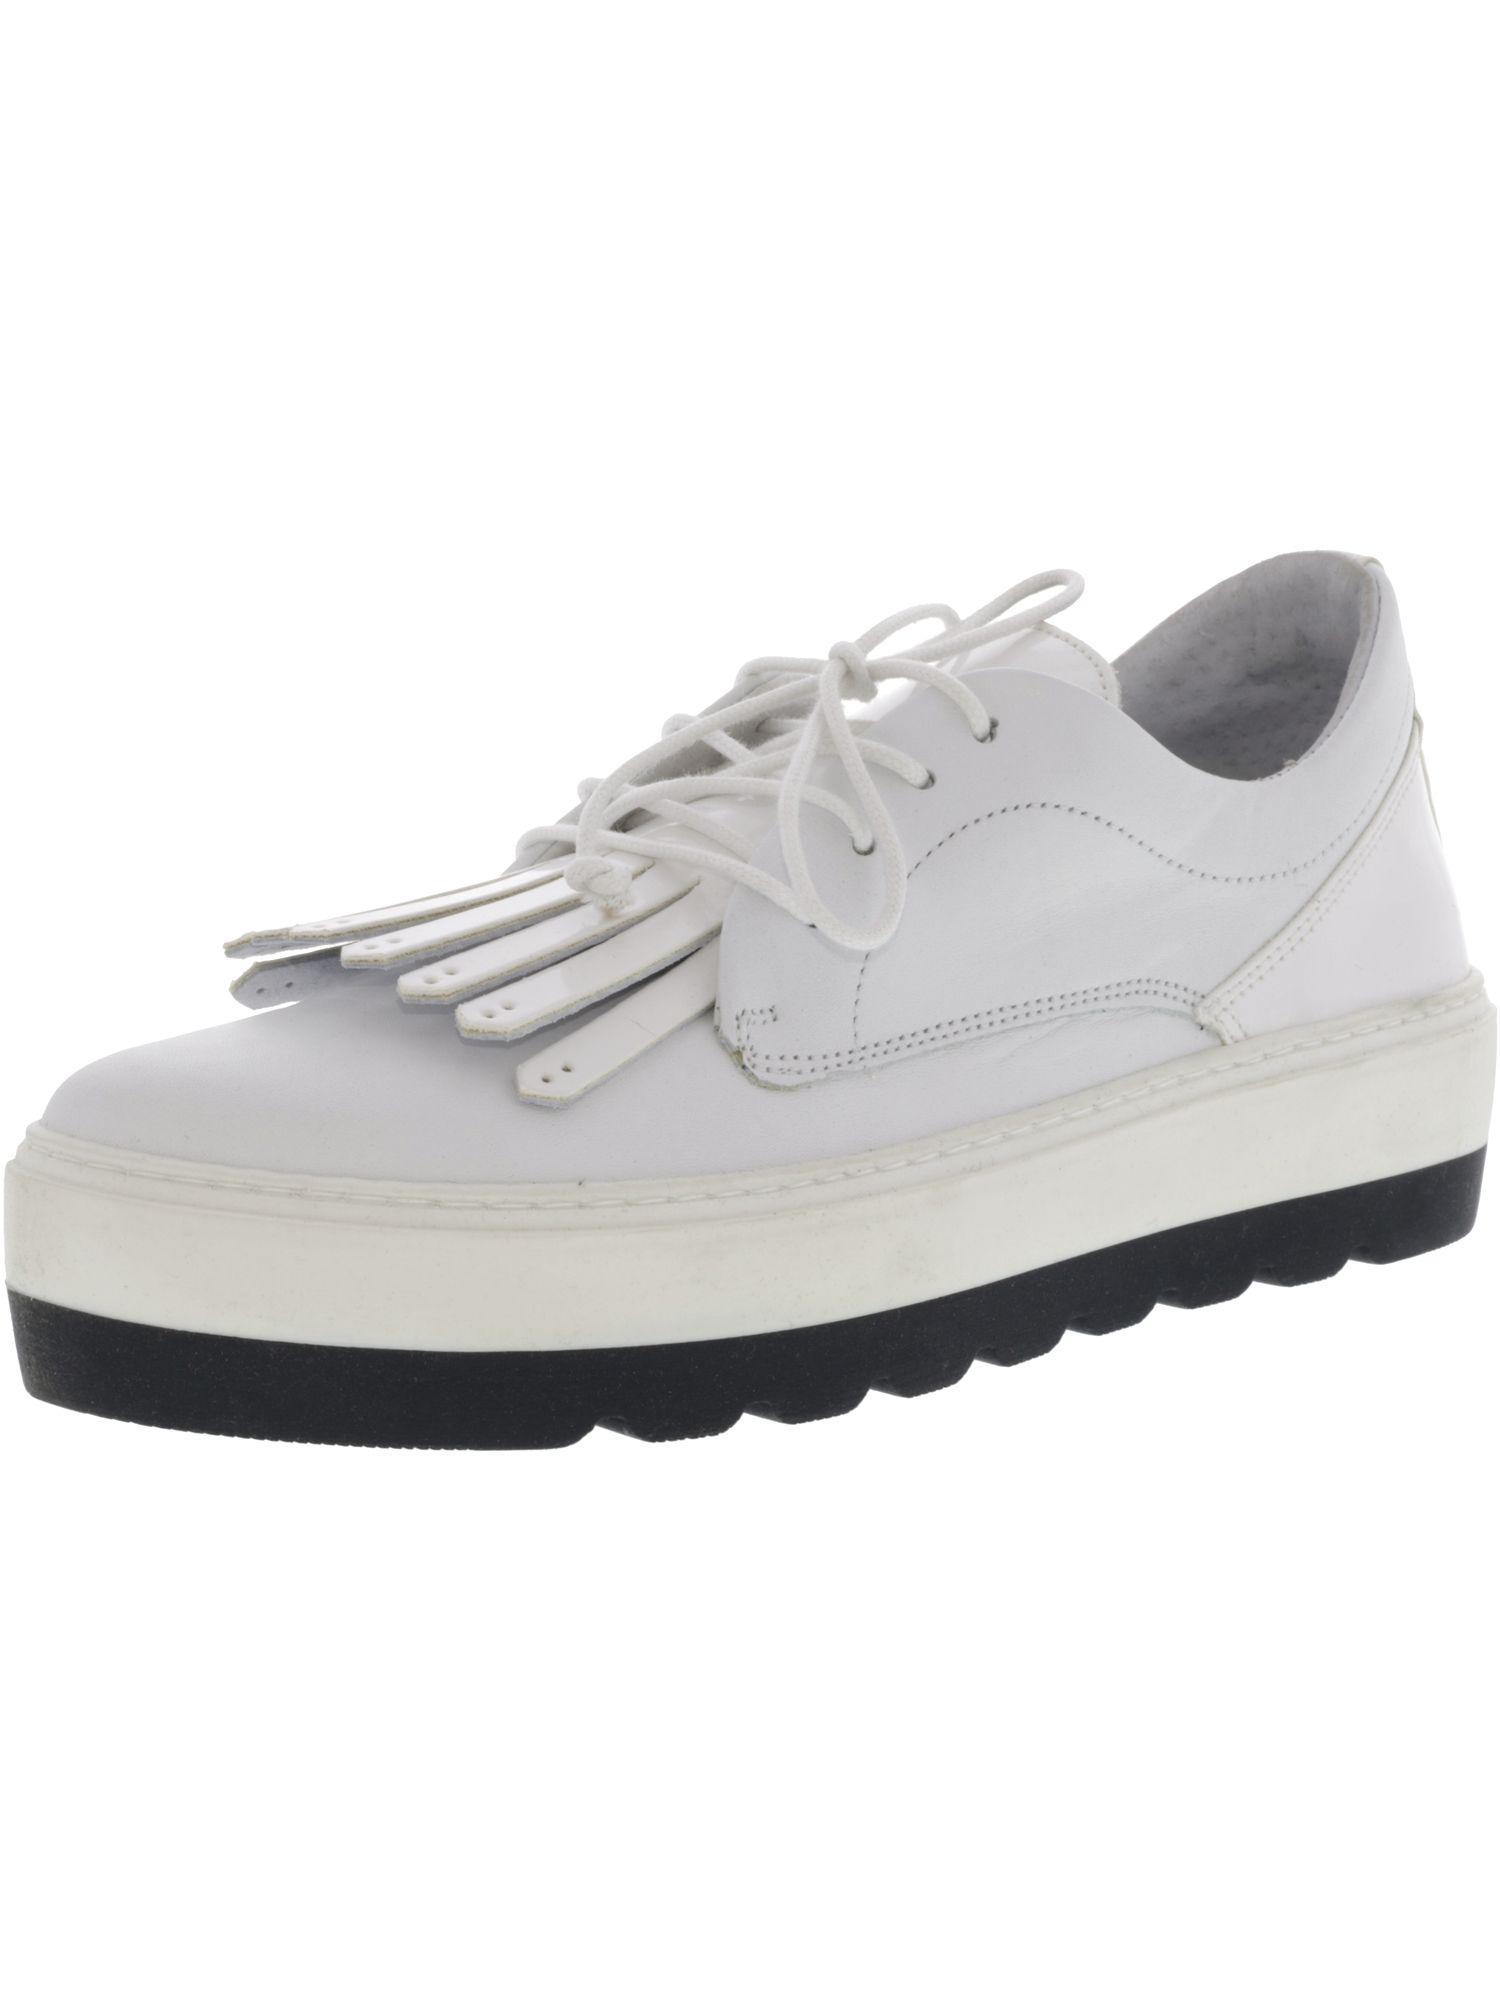 05a2ba07d24 Steve Madden. Women s White Venesaa Leather Ankle-high Fashion Sneaker ...